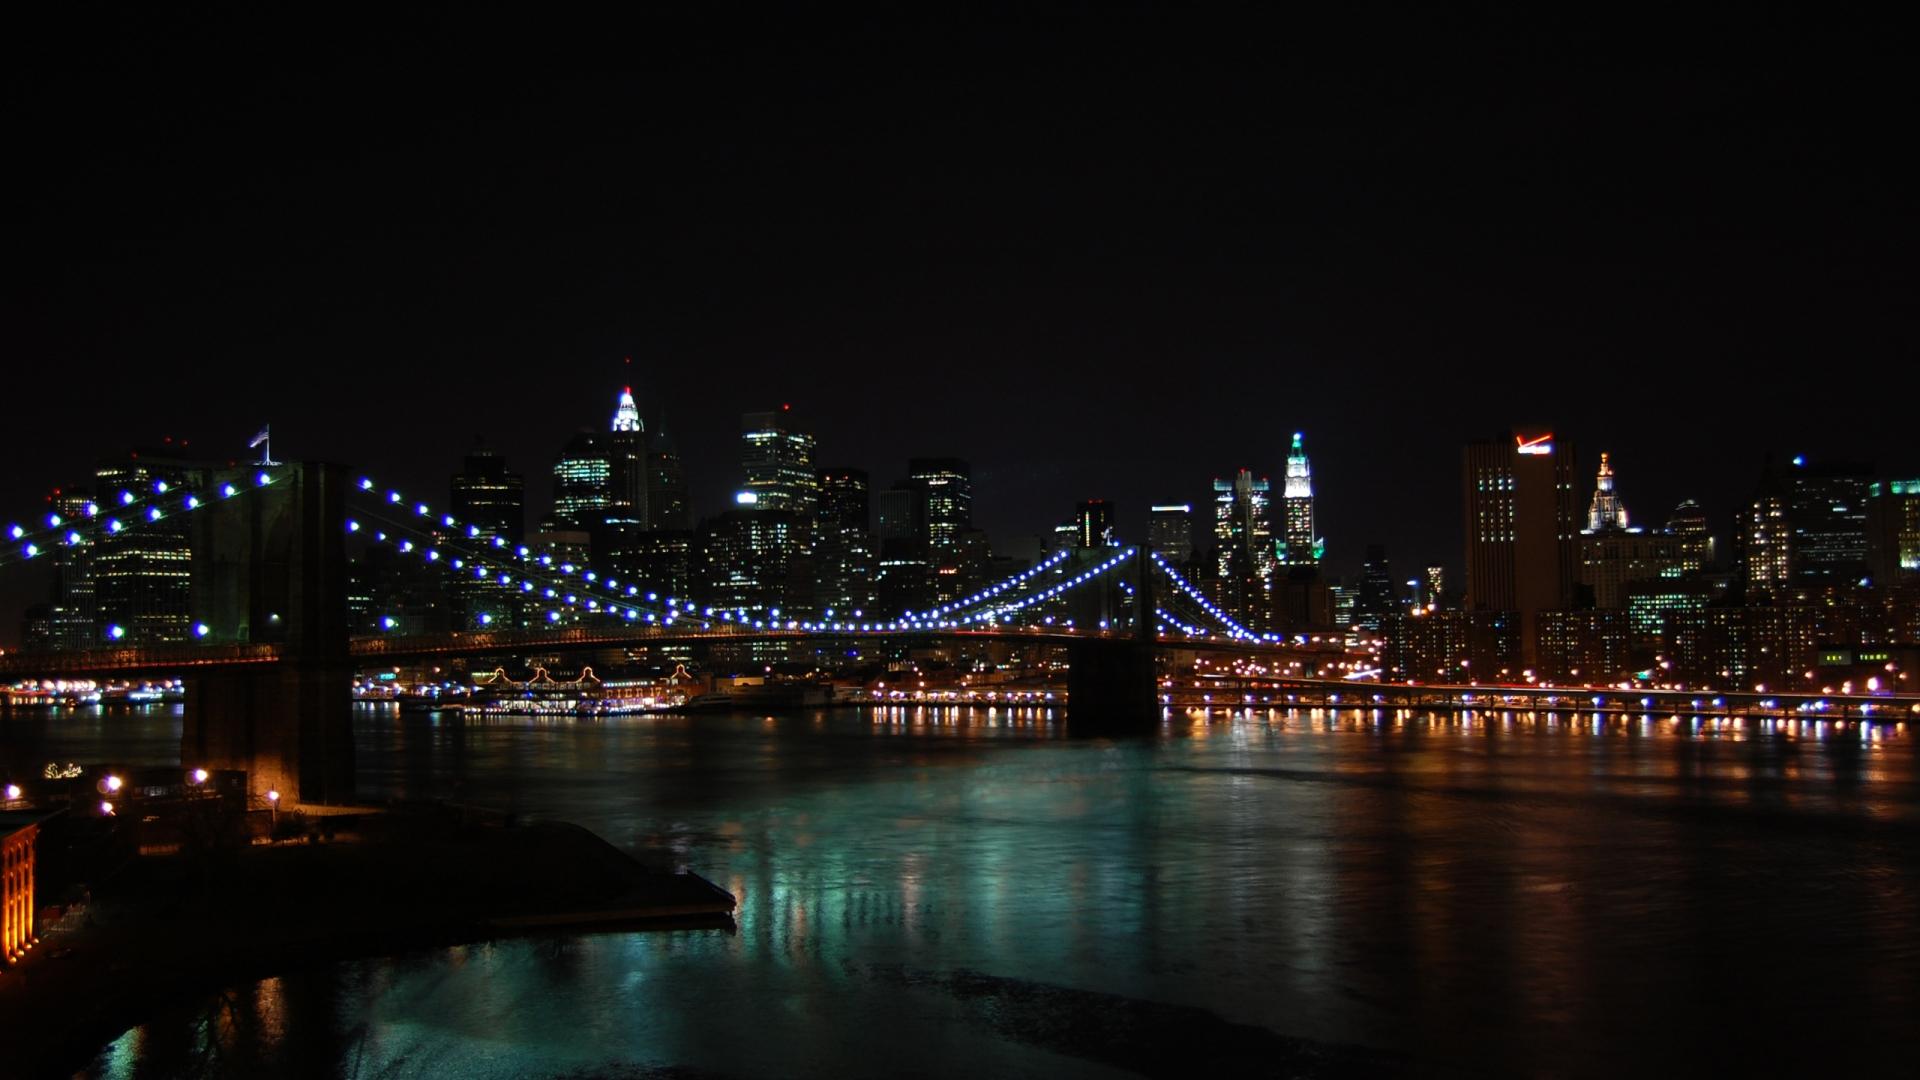 City-Bridge-Wallpaper